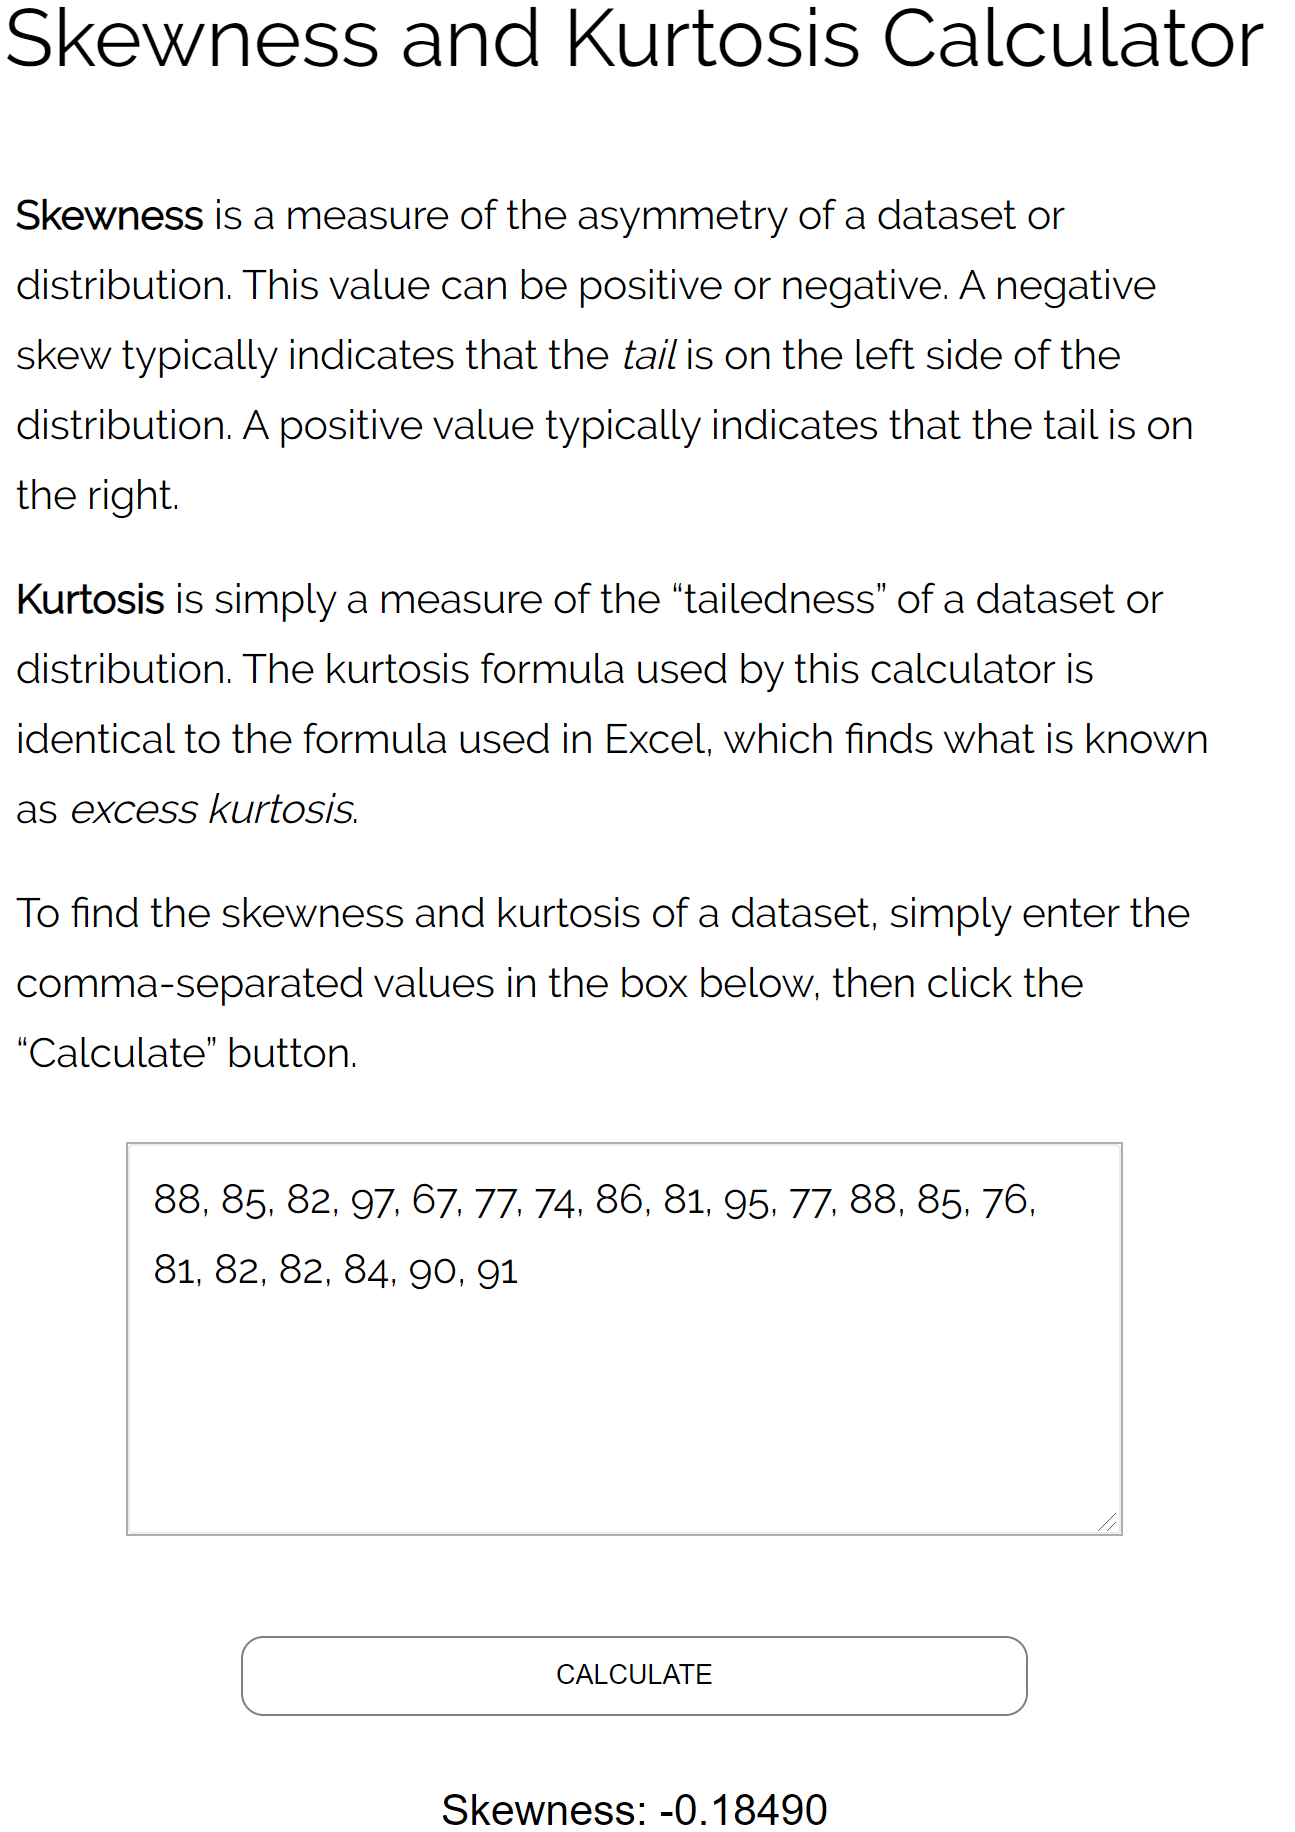 Skewness calculator example